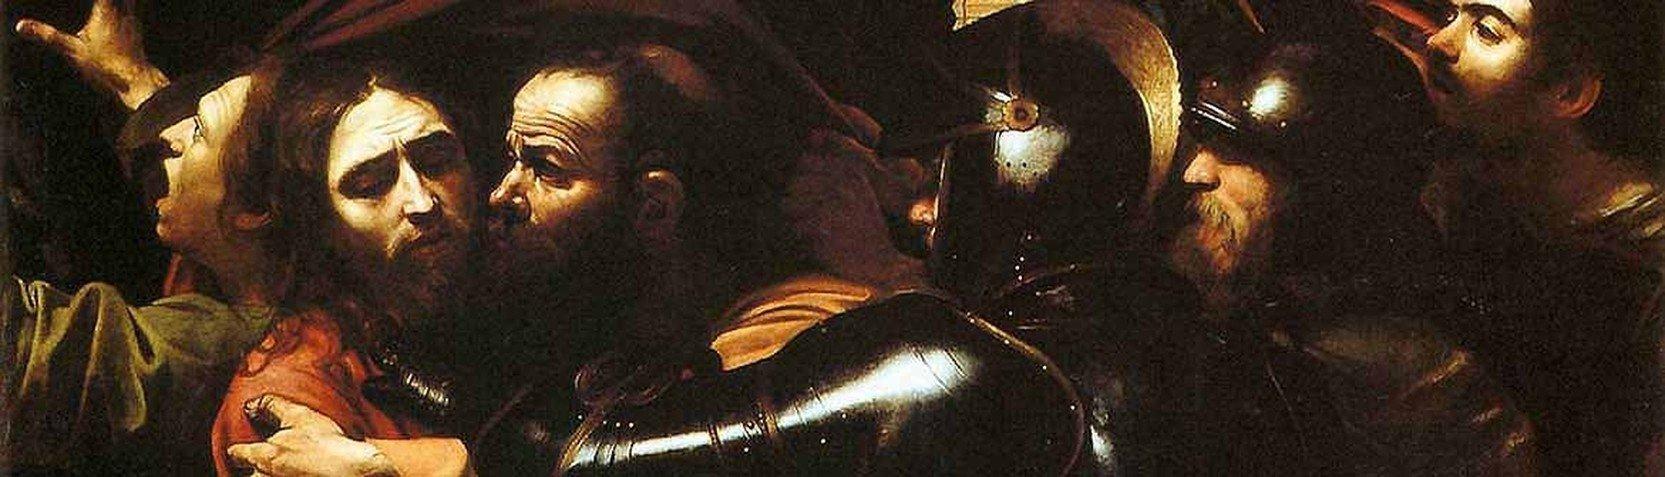 Artists - Michelangelo Caravaggio